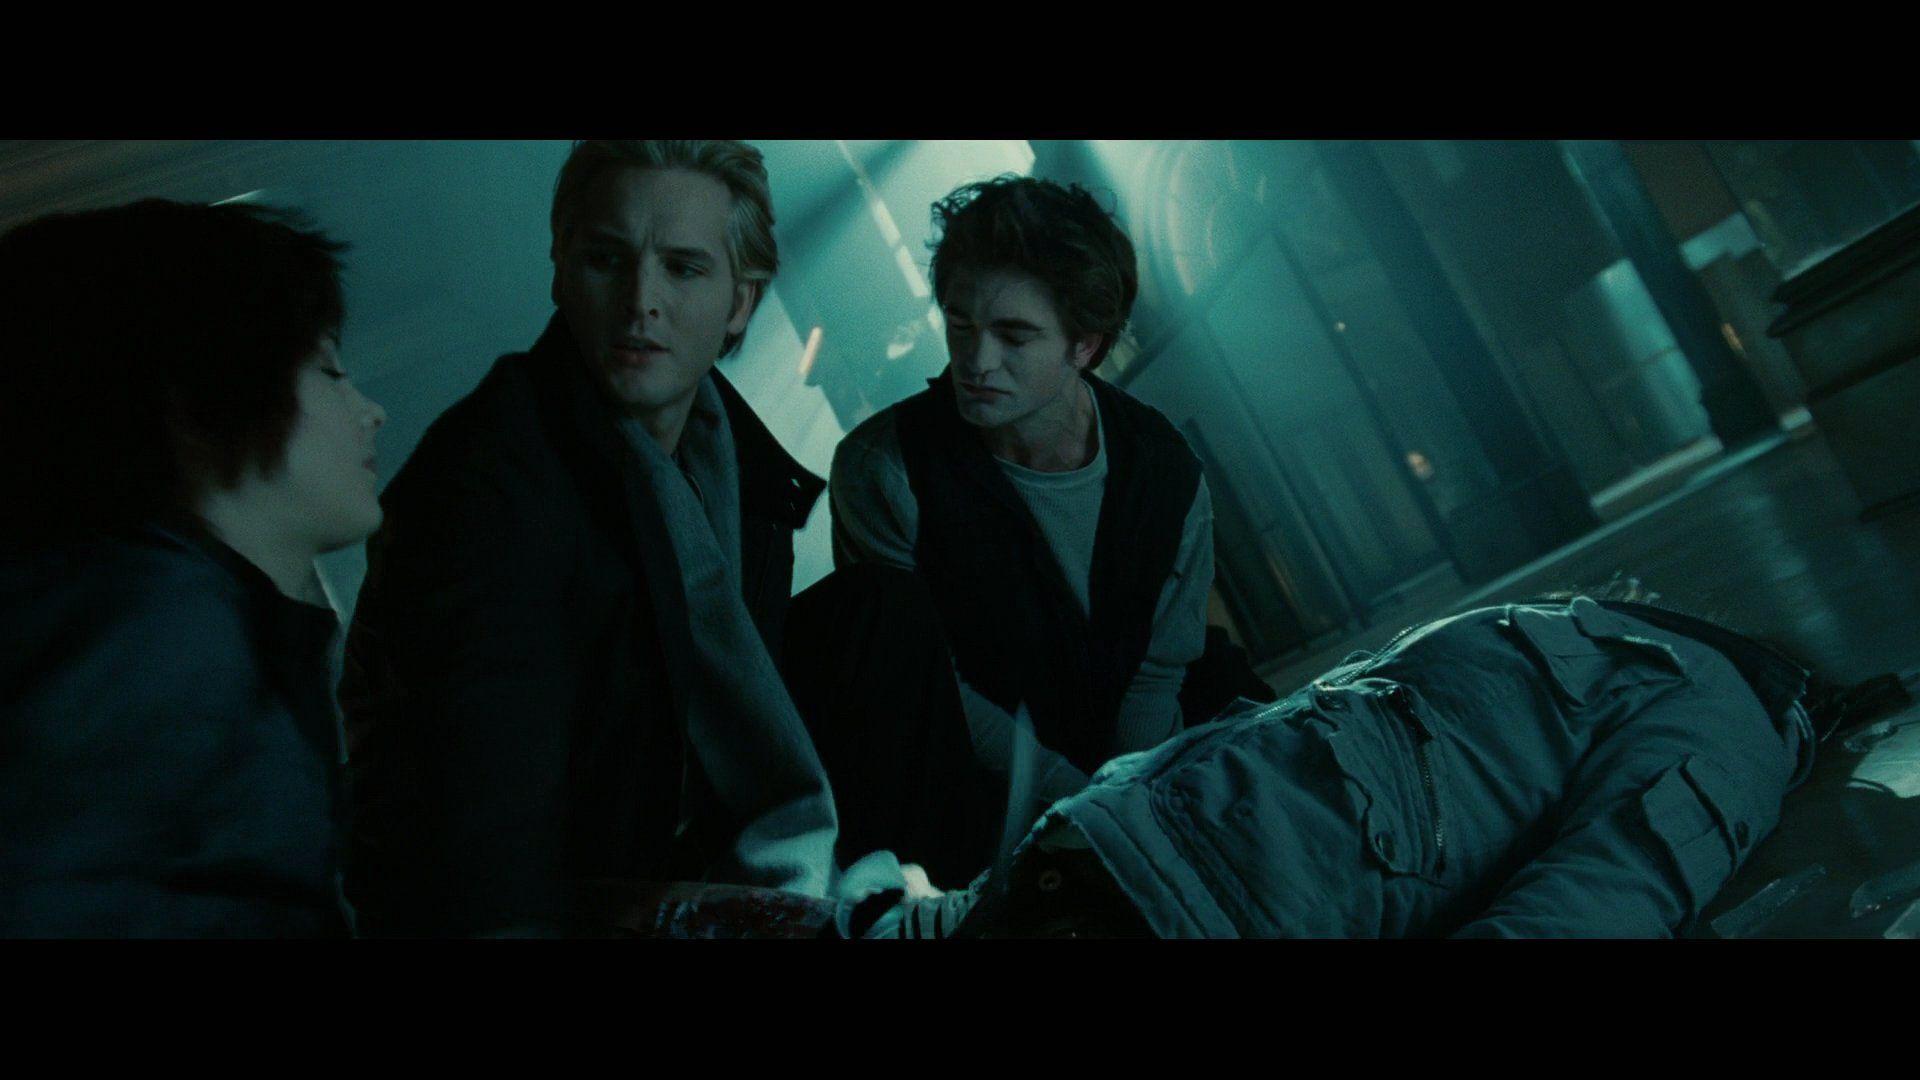 Pin van Amanda op Twilight Screencaps